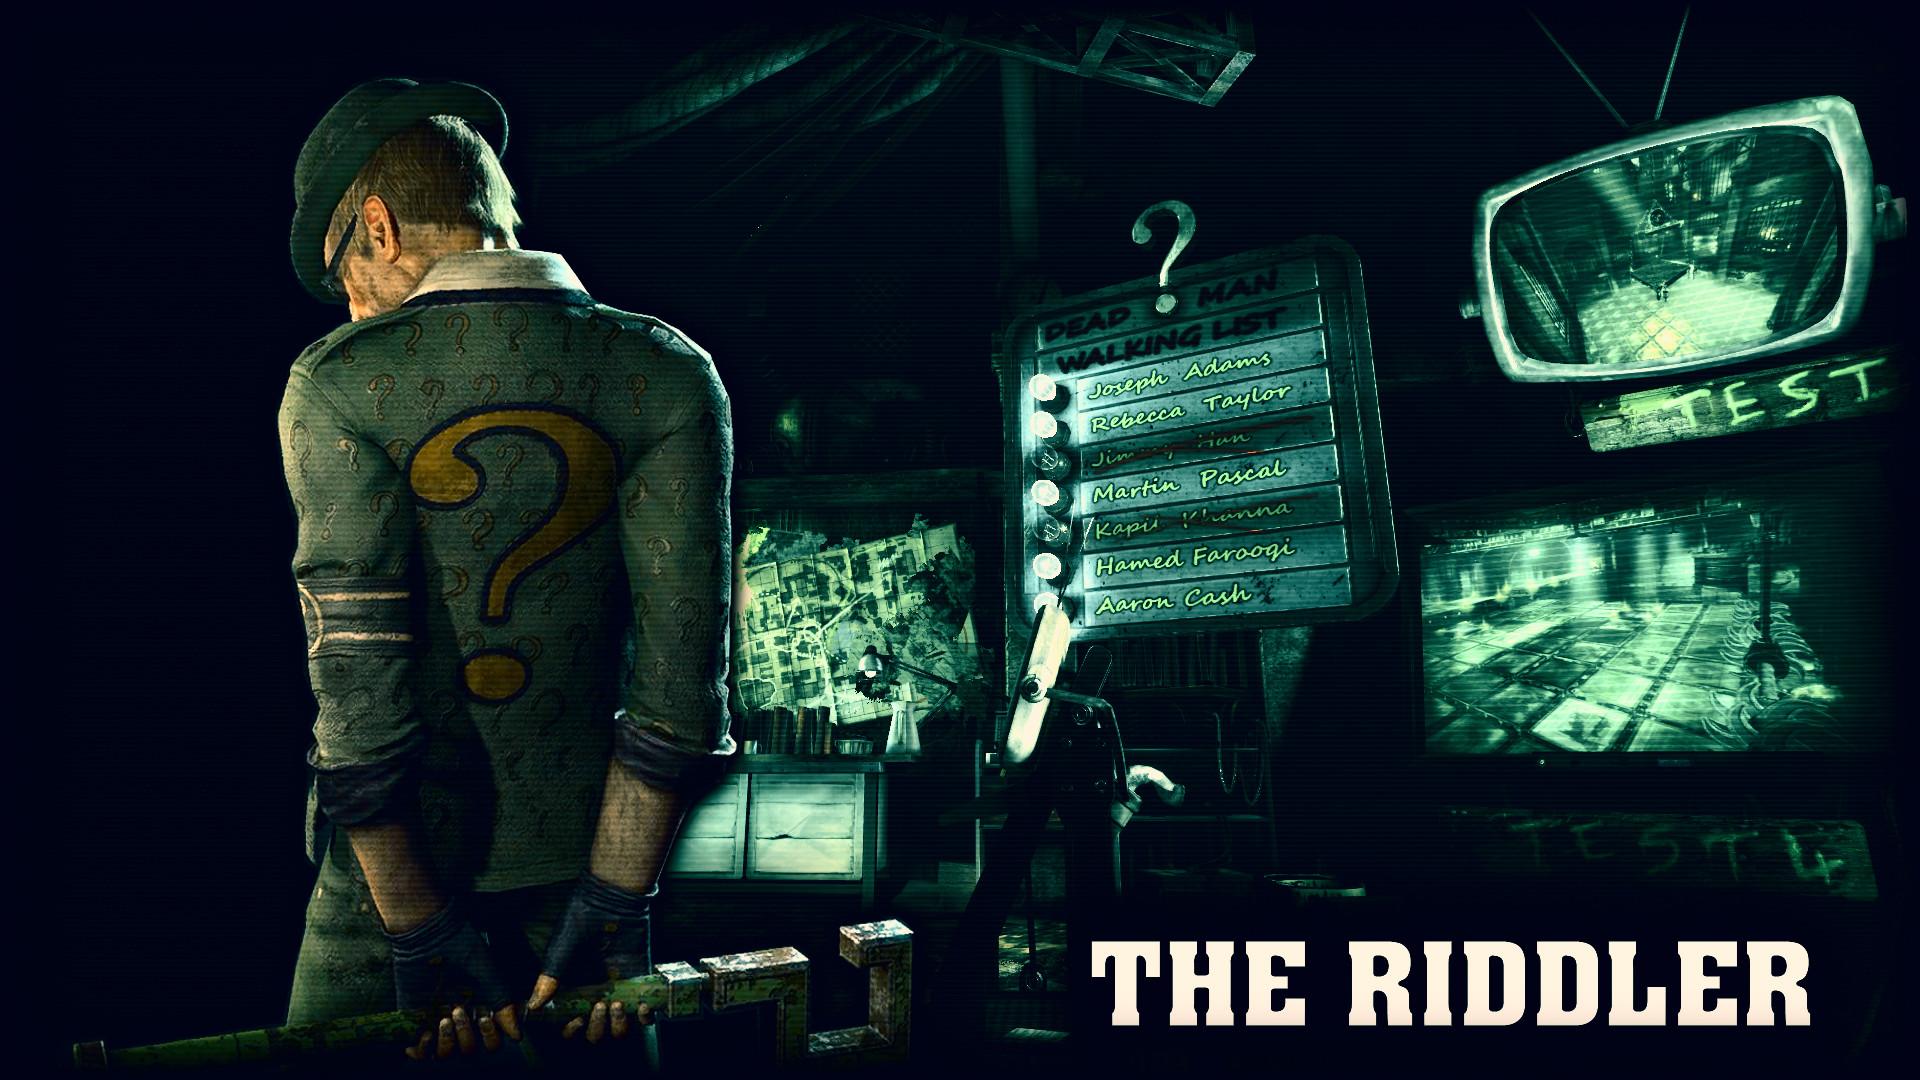 … riddler wallpaper wallpapersafari; console games wallpapers page 187 …